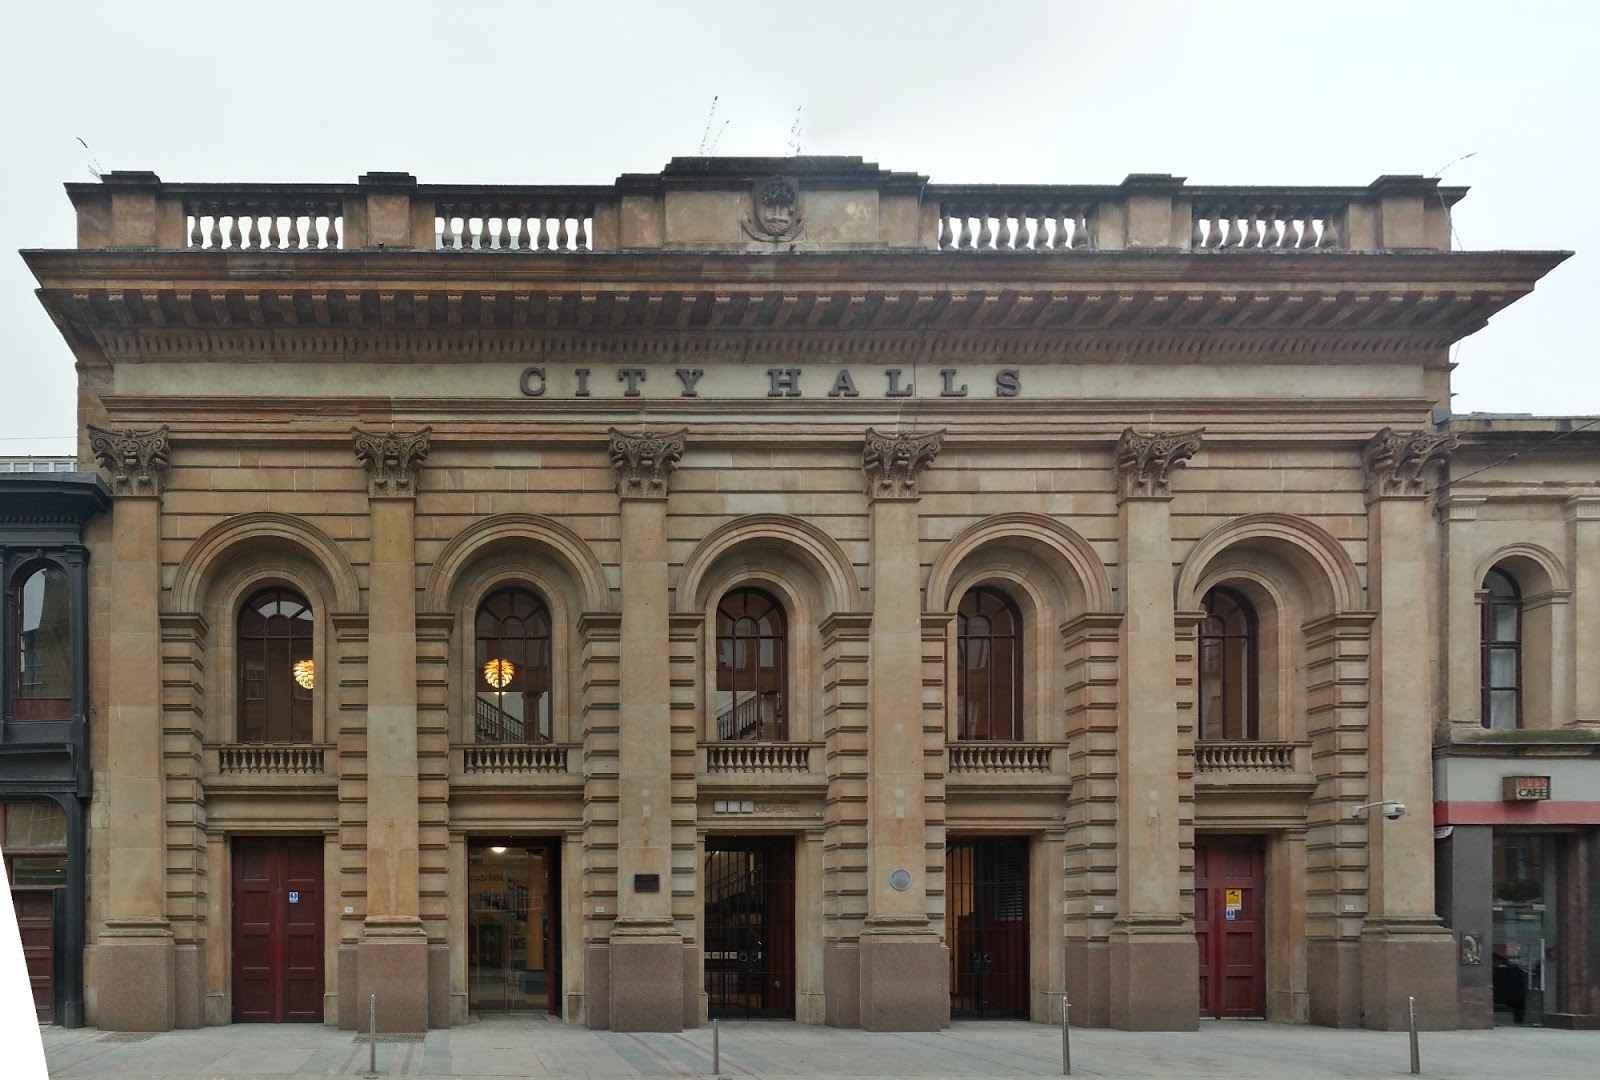 City Halls, Glasgow